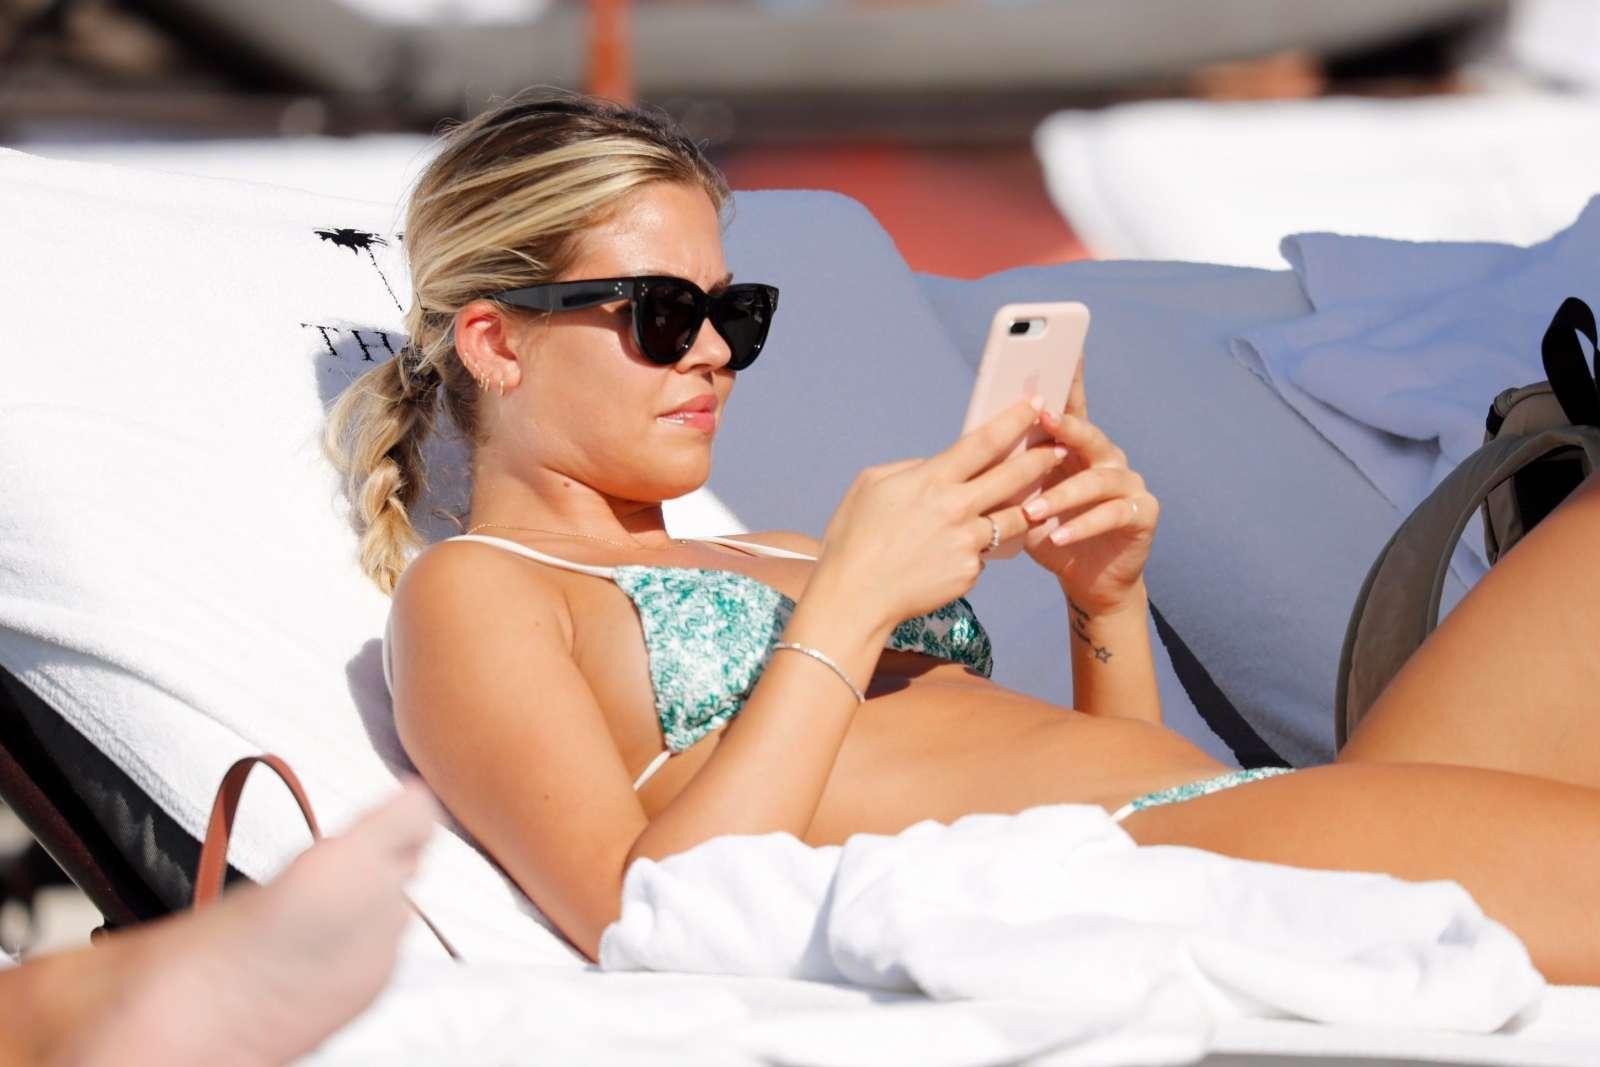 Constance Caracciolo 2017 : Constance Caracciolo in Bikini Sunbathing -15